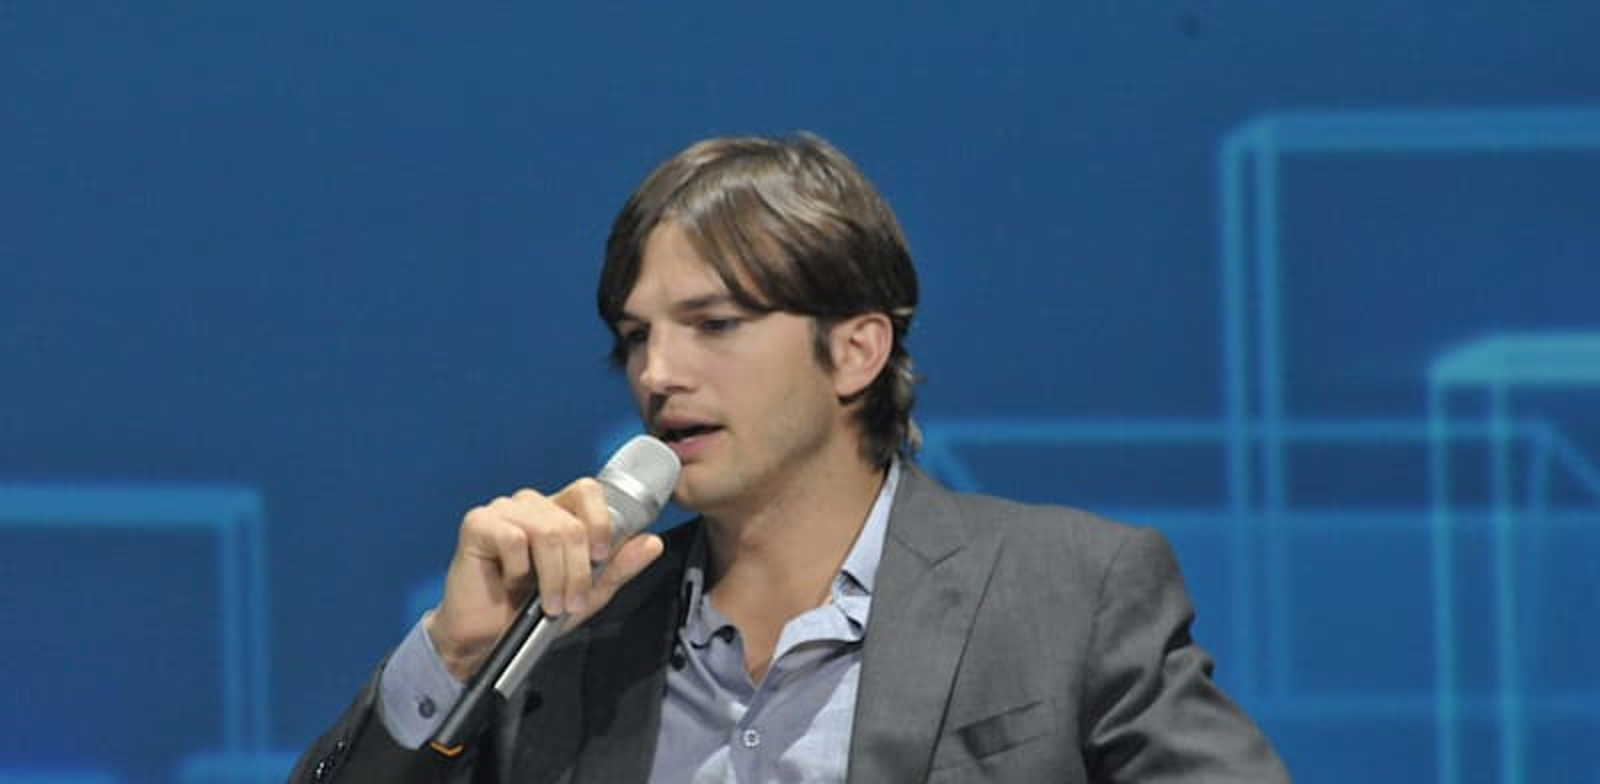 Ashton Kutcher Photo: Tamar Matsafi